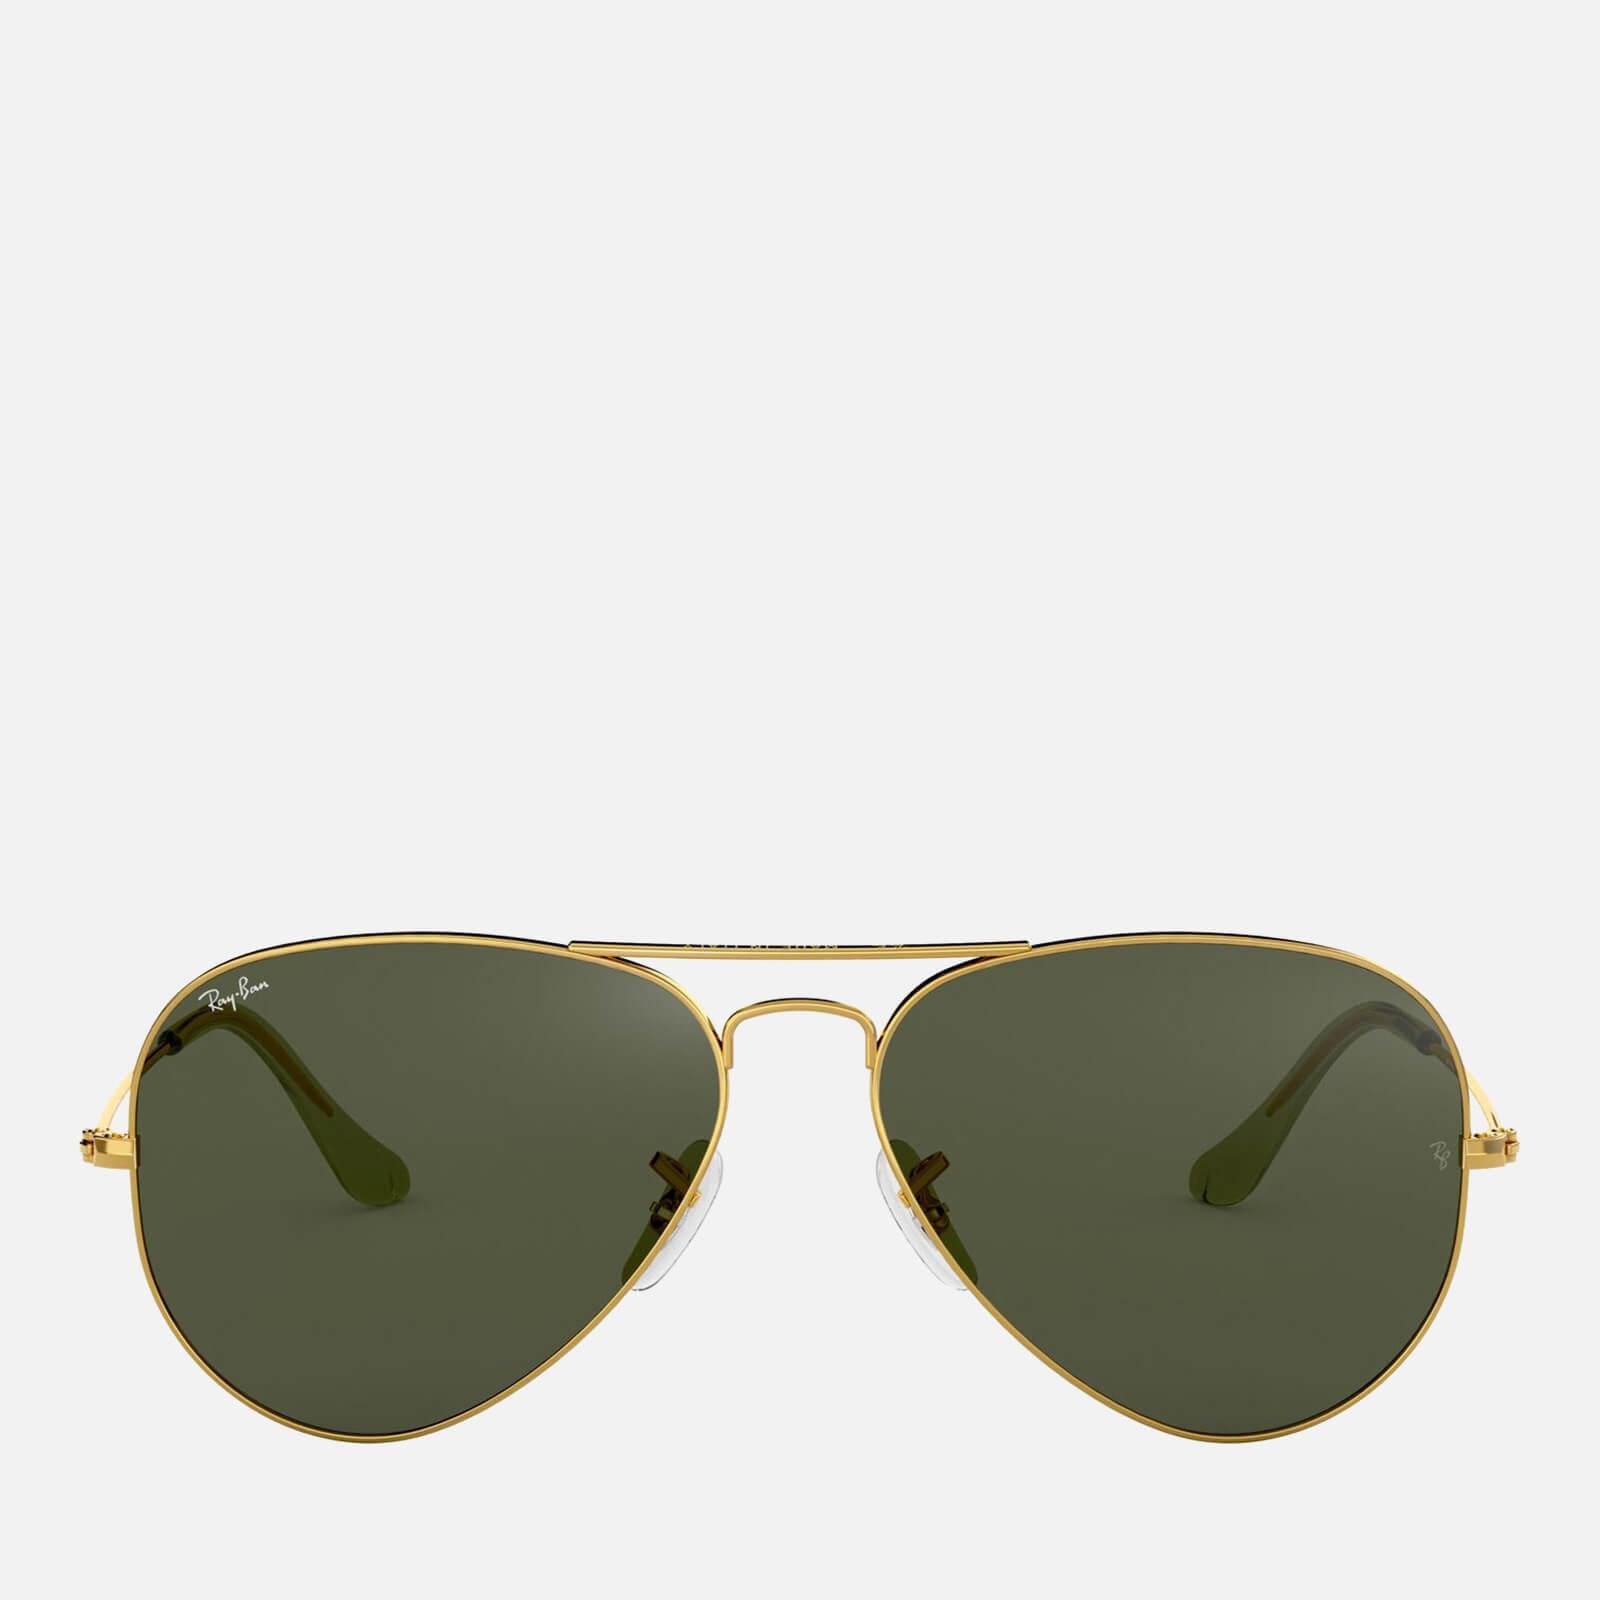 Ray-Ban Women's Metal Aviator Sunglasses - Gold